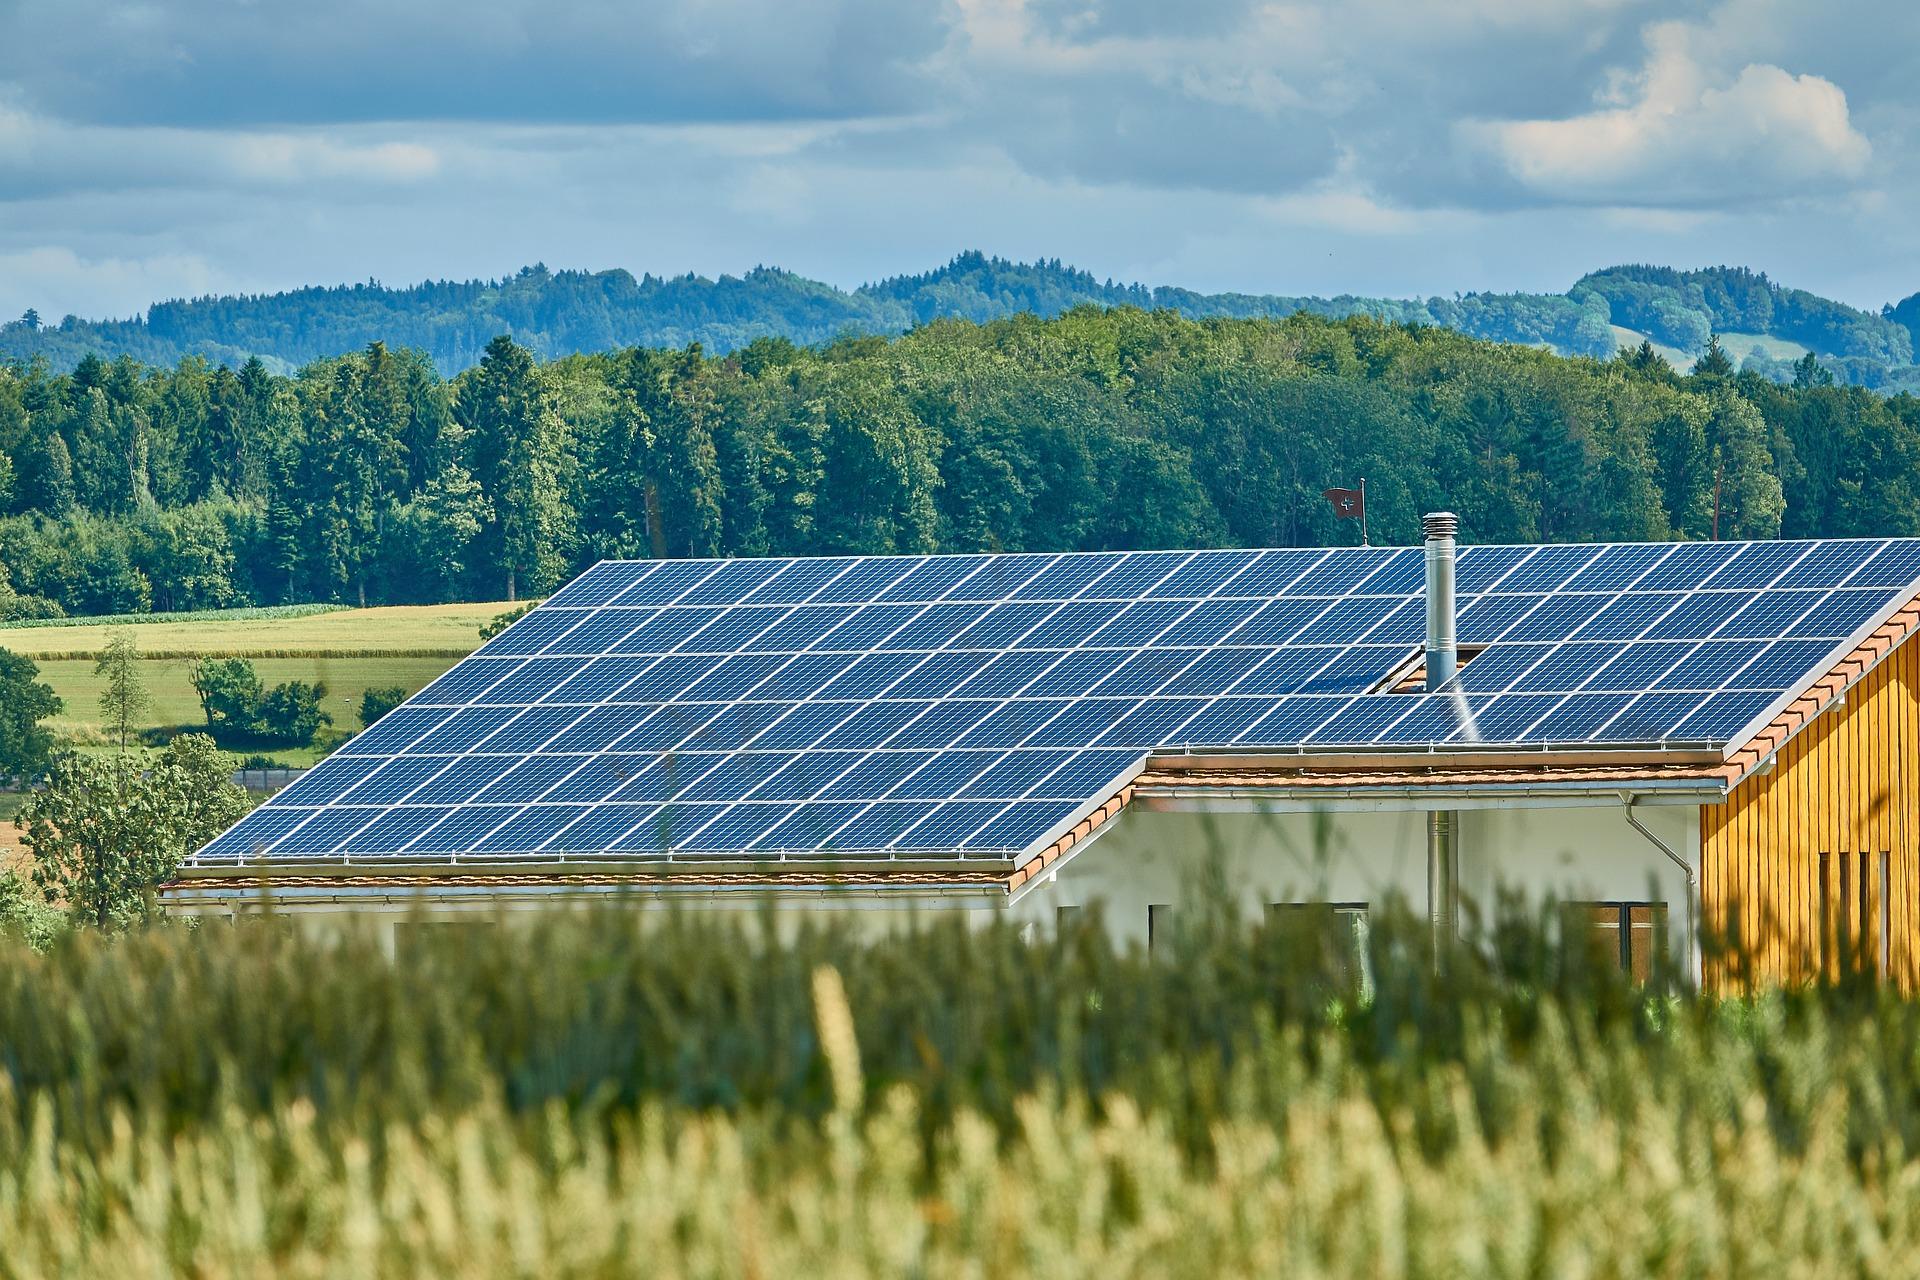 Agricoltura e fonti rinnovabili